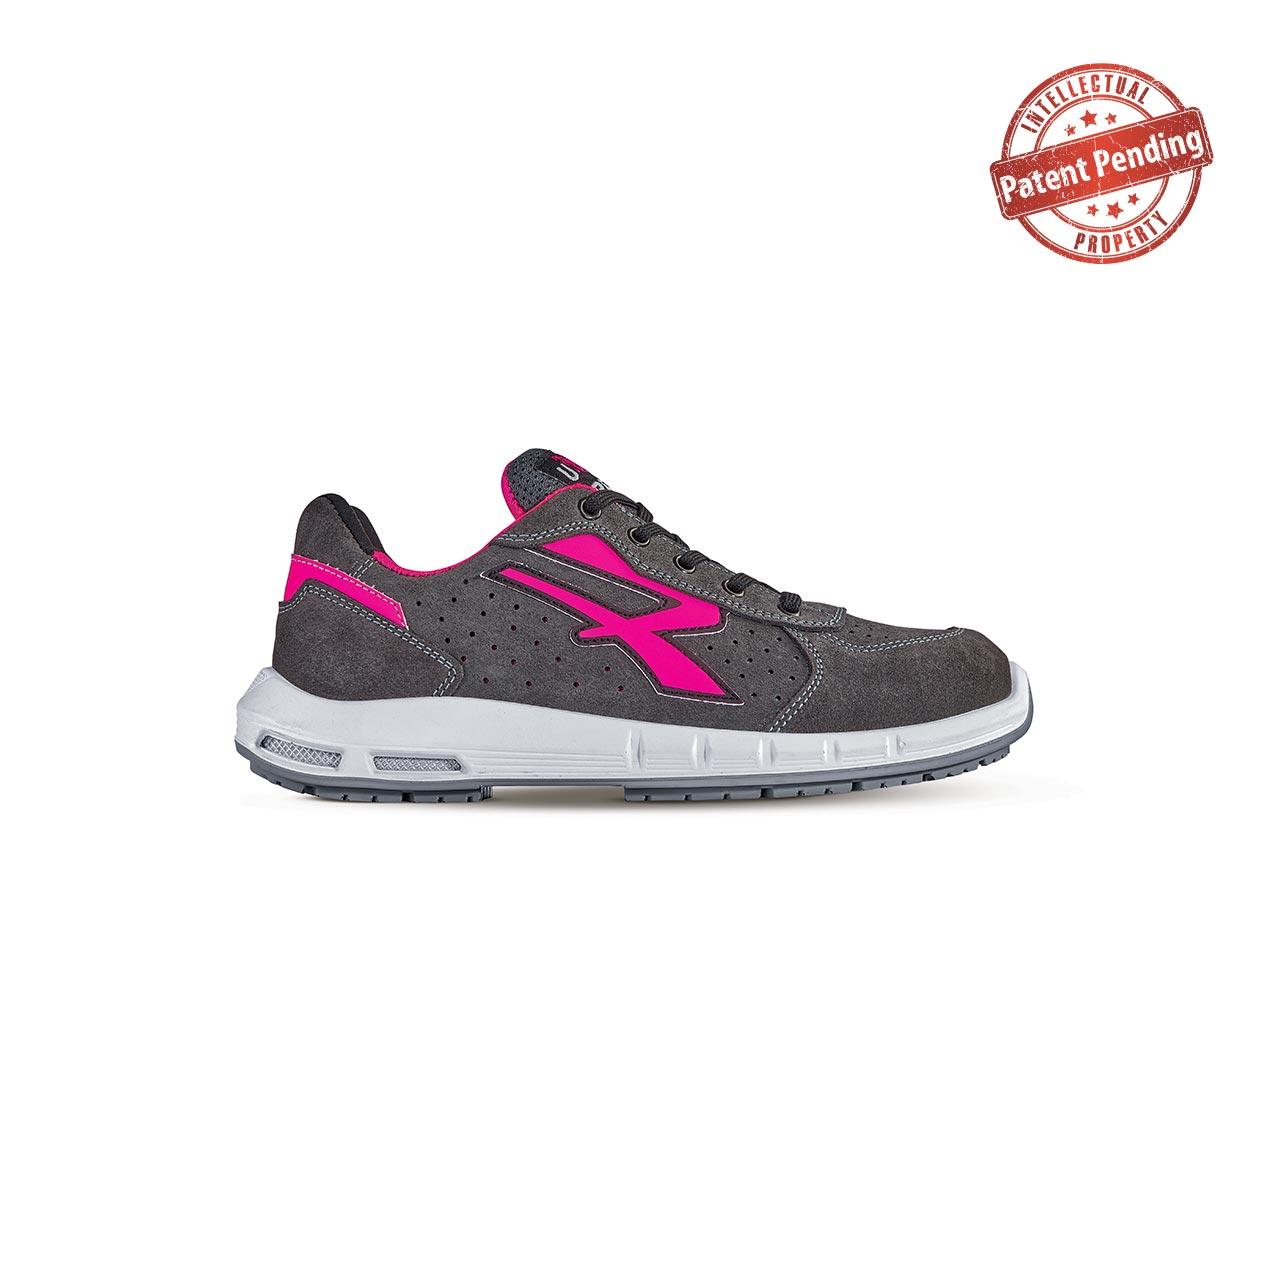 scarpa antinfortunistica upower modello electra plus linea redup plus vista laterale